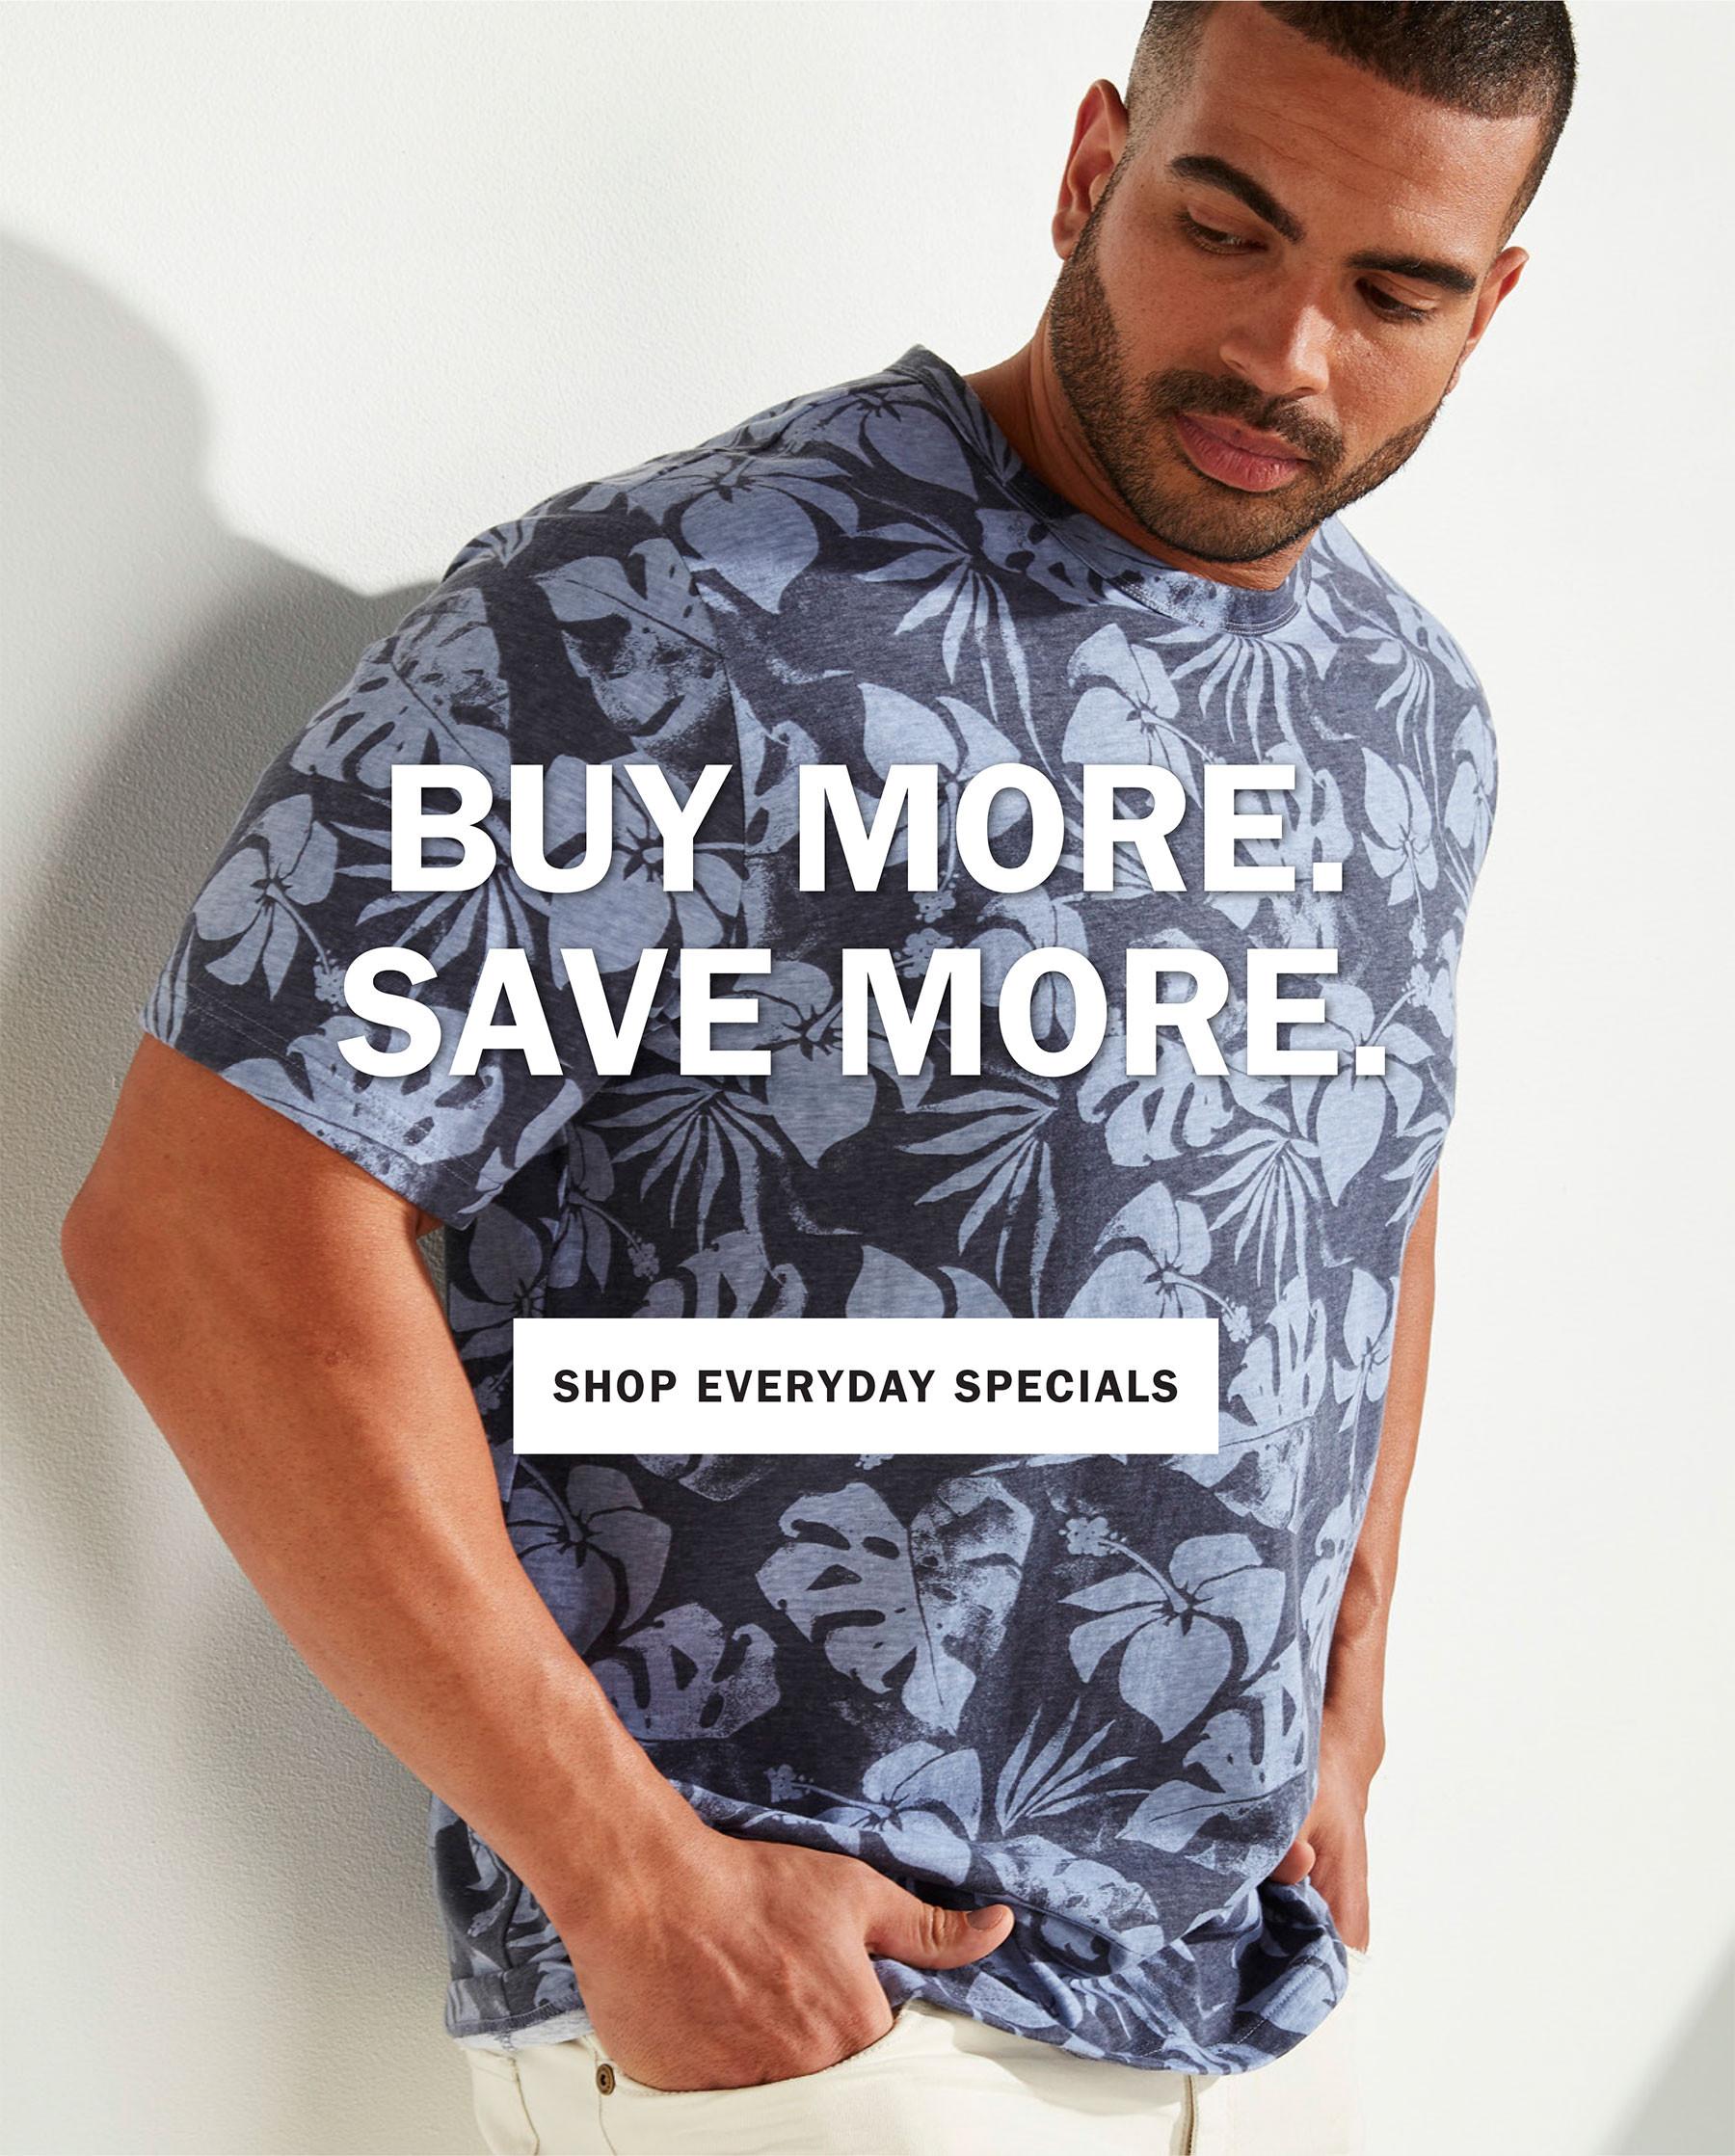 BUY MORE. SAVE MOVE. | SHOP EVERYDAY SPECIALS